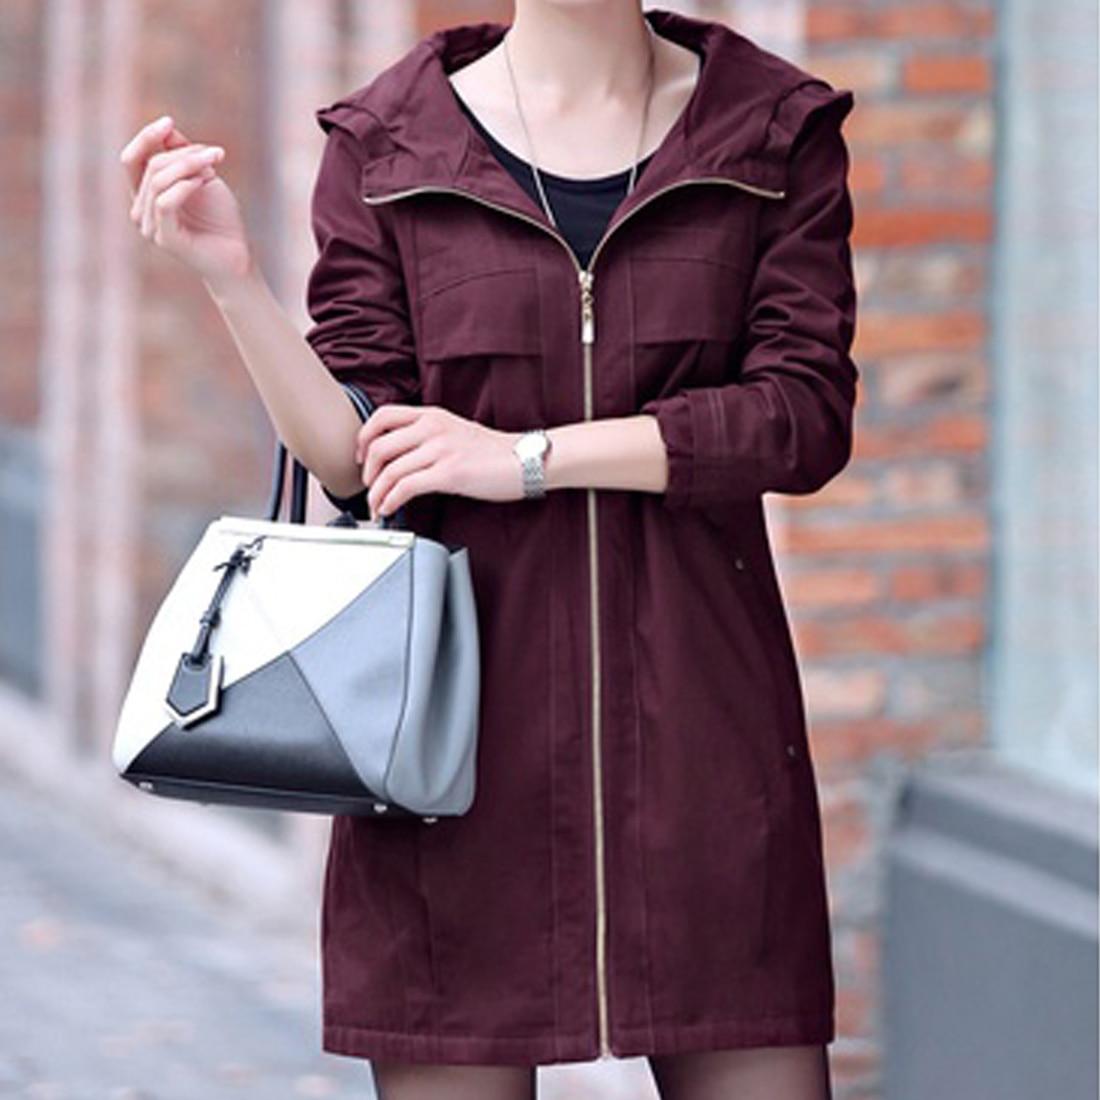 2017 Fashion Winter Women's   Trench   Coat With A Hood Warm Cotton Spliced Big Size Windbreaker Female Outerwear